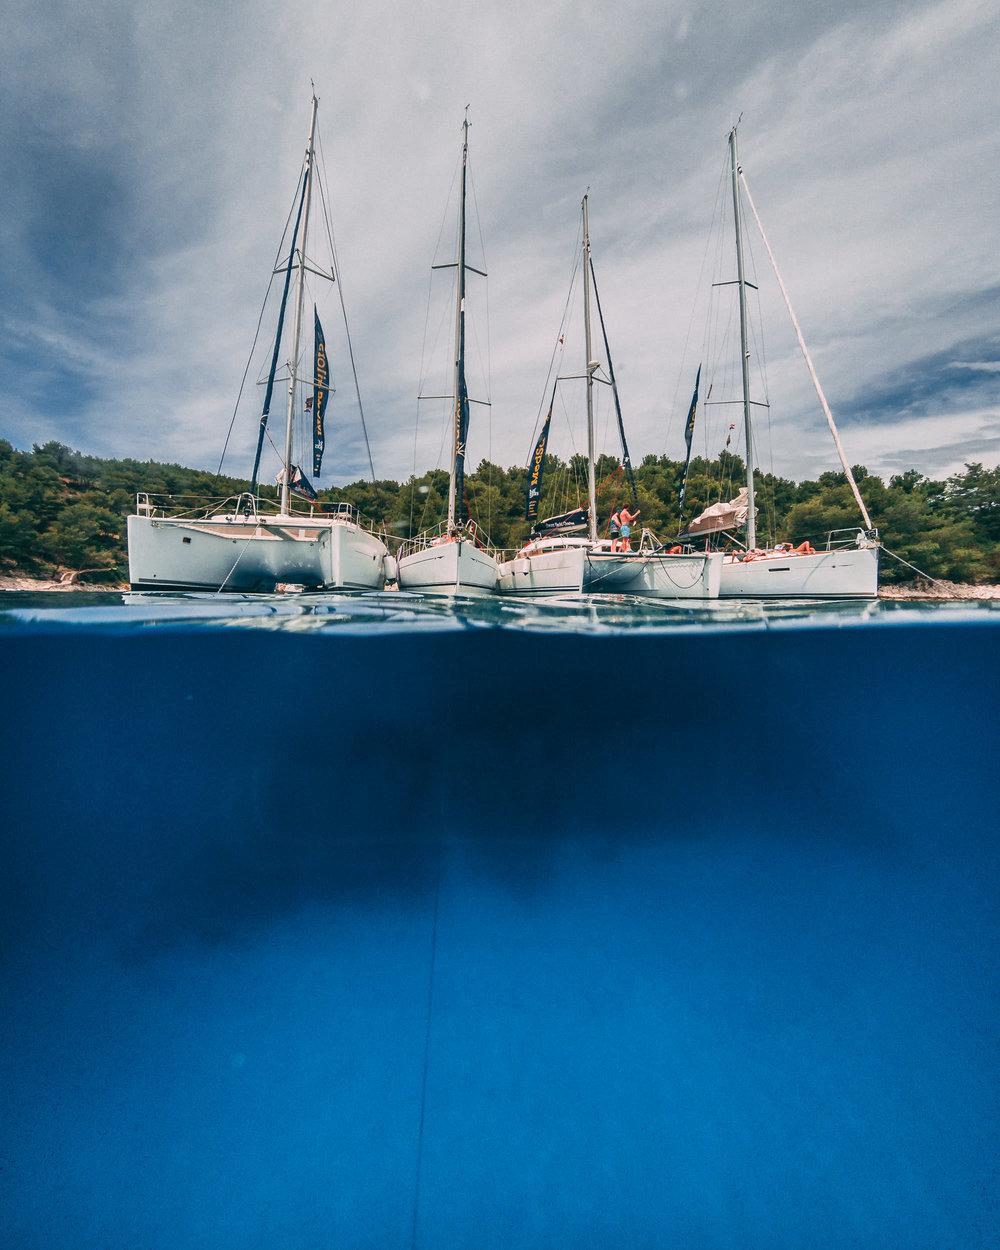 Tying our yachts together to create a raft on the coast of Hvar Island, Croatia